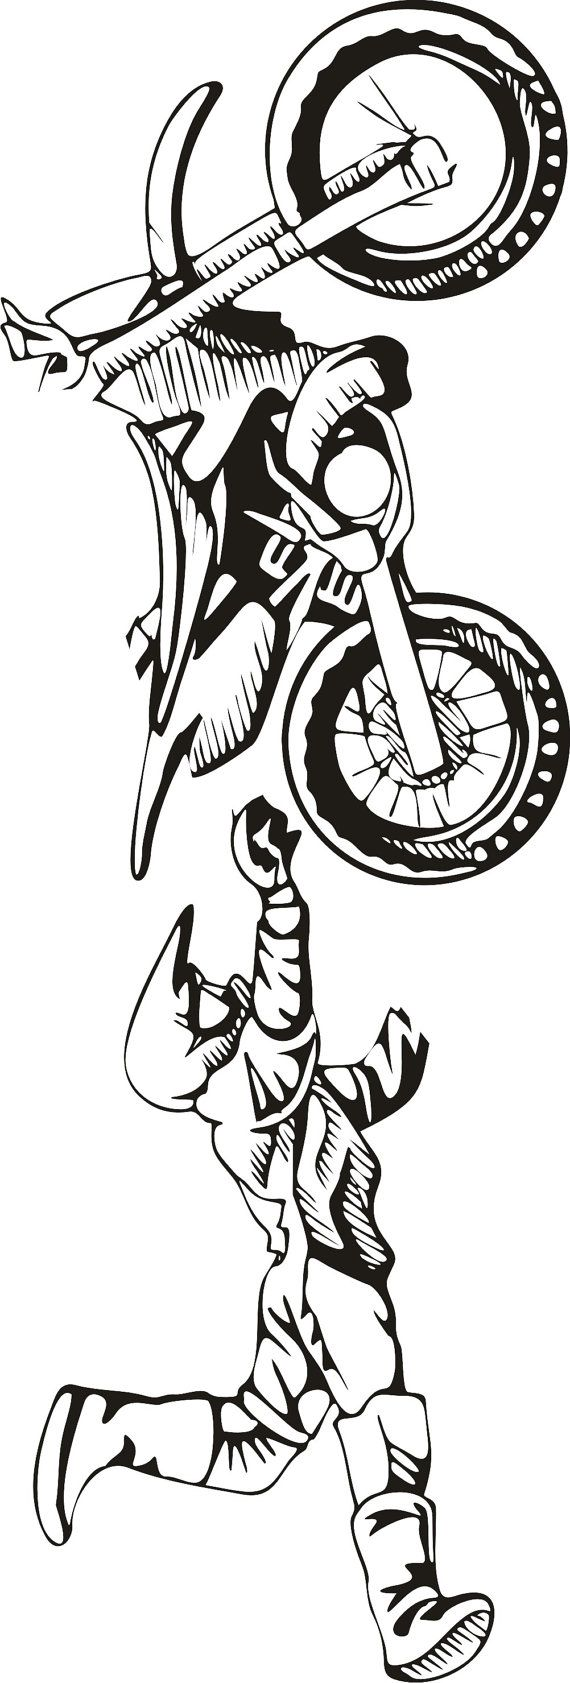 LARGE Motocross Vinyl Decal Wall Sticker Wall Tattoo by Tibi291